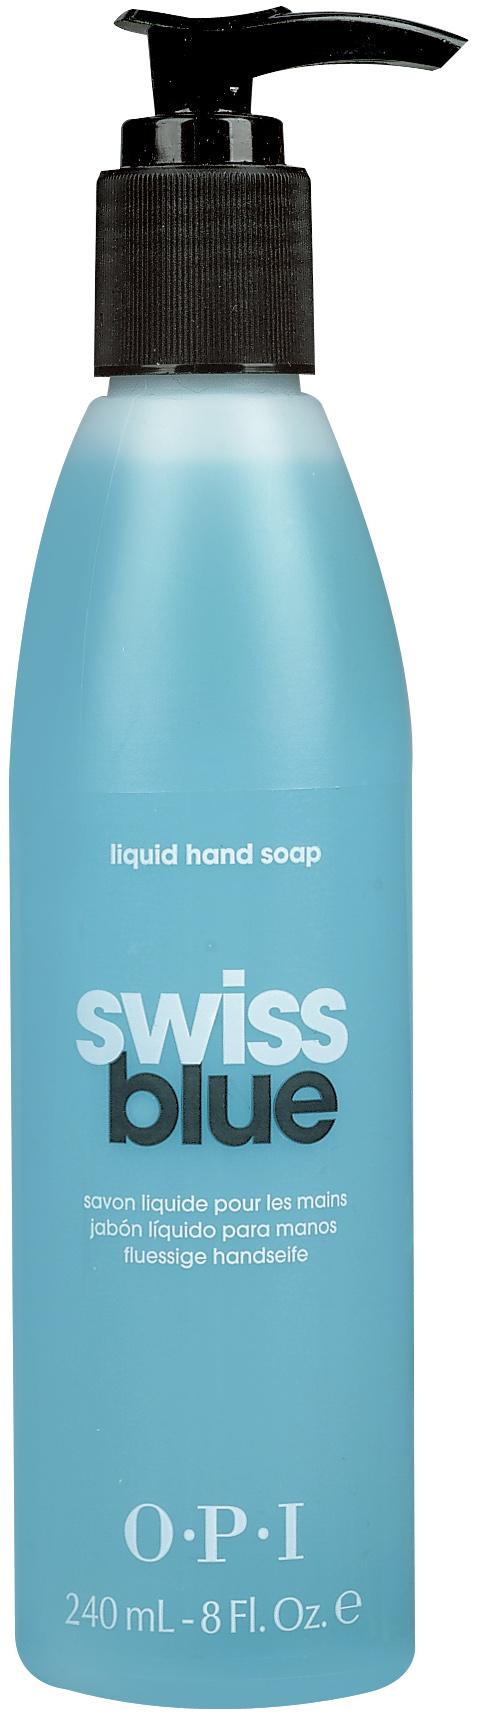 OPI Мыло для рук / Swiss Blue 240мл